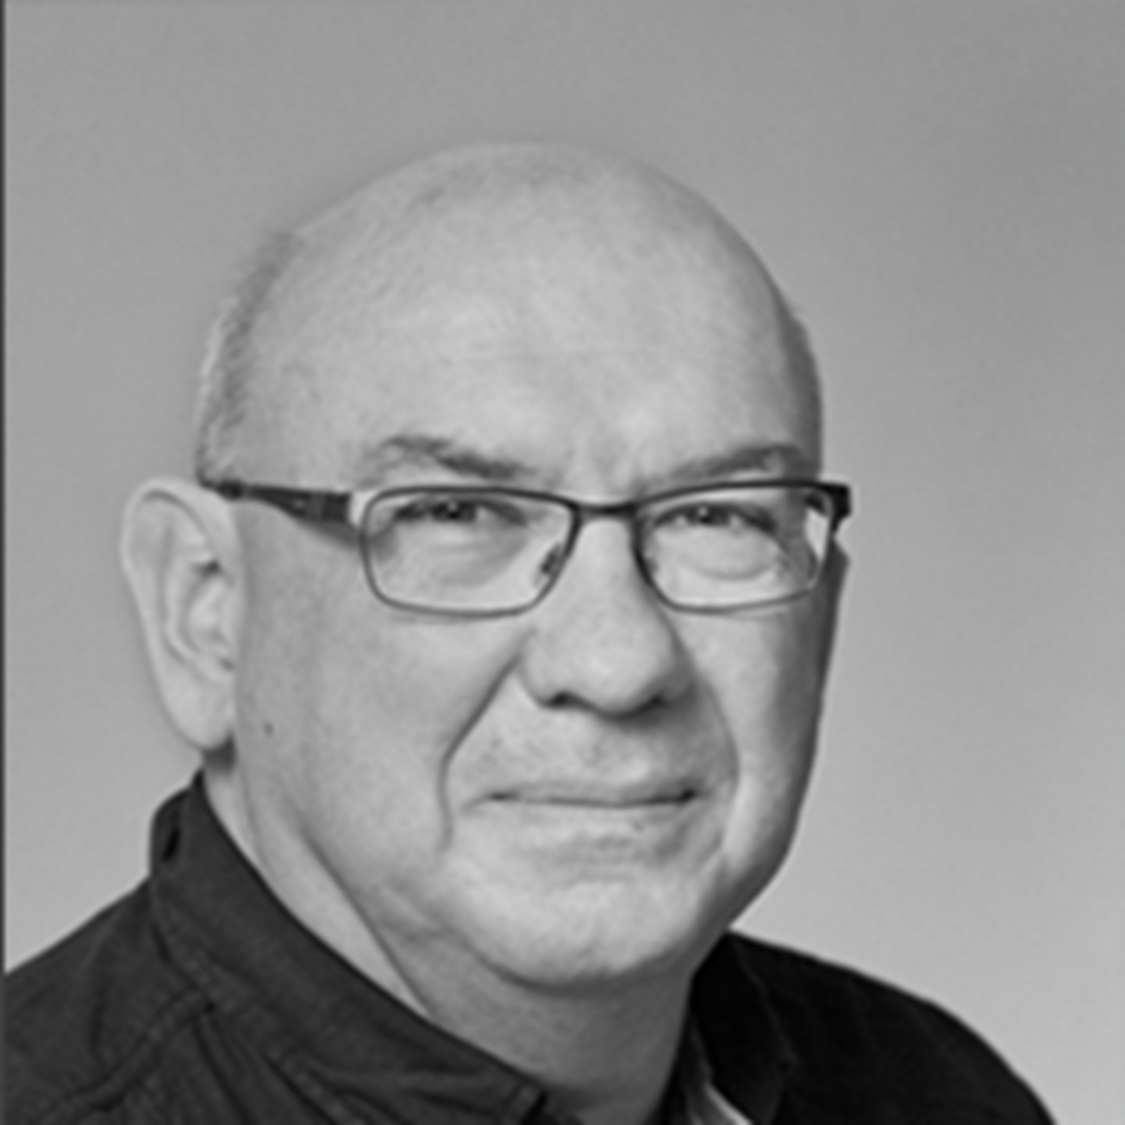 Andreas Ostermeier